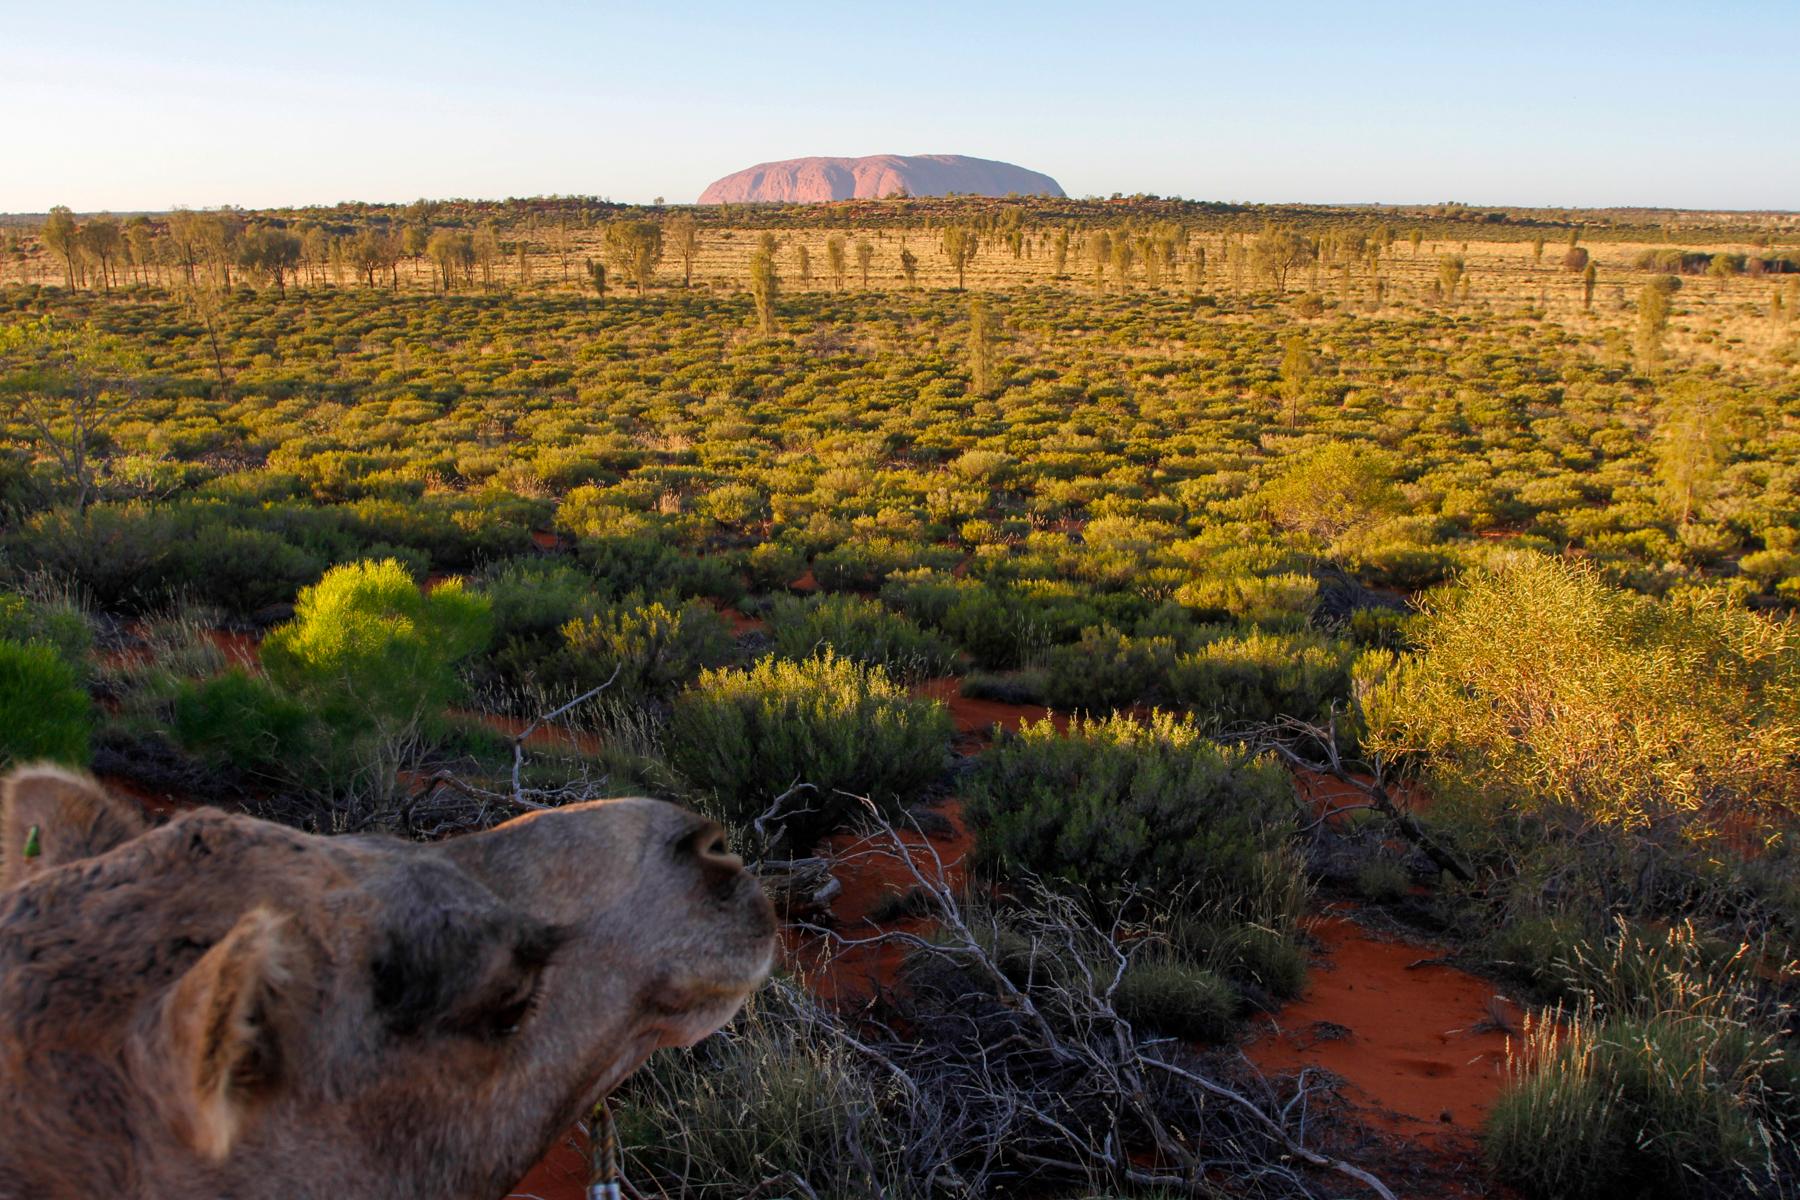 mg 2034 lr What to do in Uluru